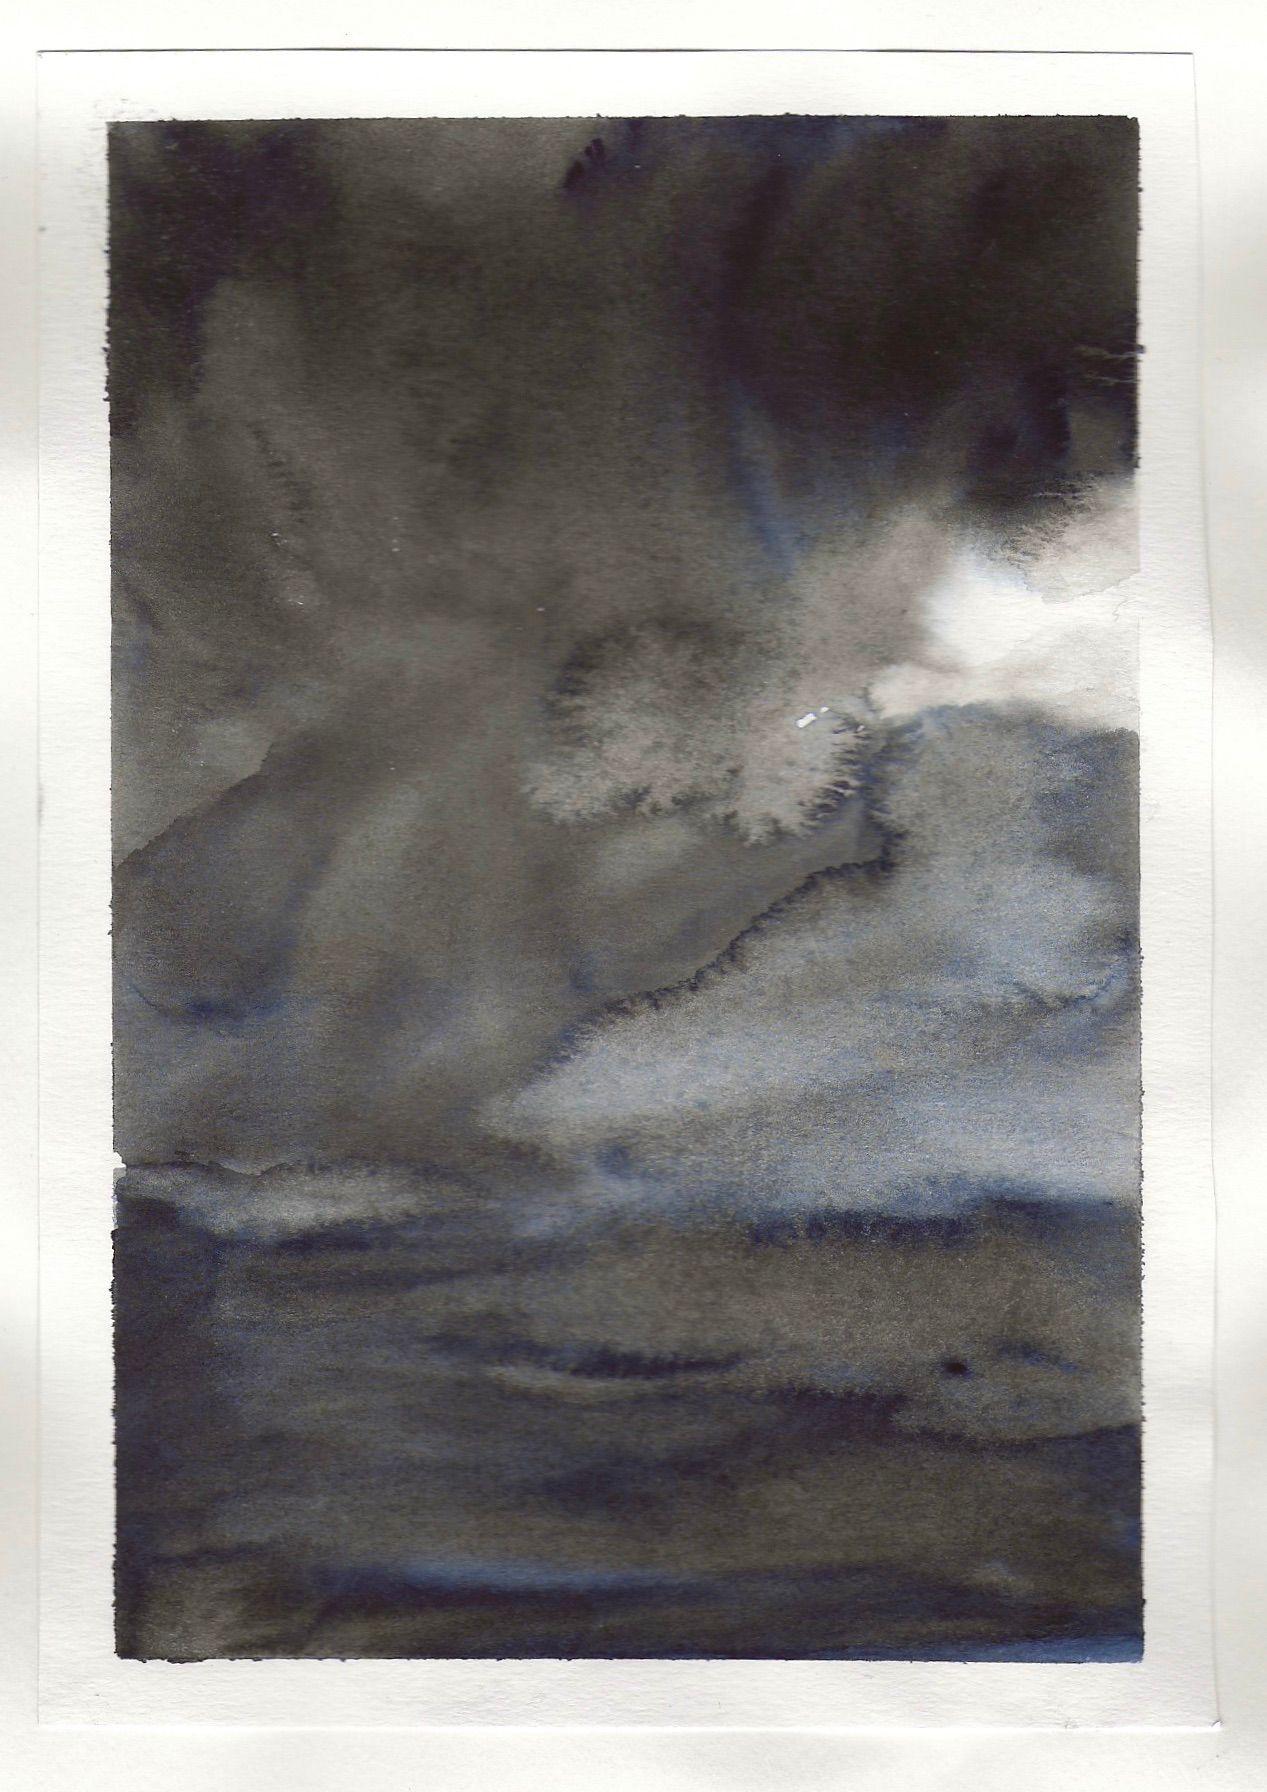 watercolour studies - sequence 1 - #5 - watercolour - 148 x 210mm - 200gsm 120lb